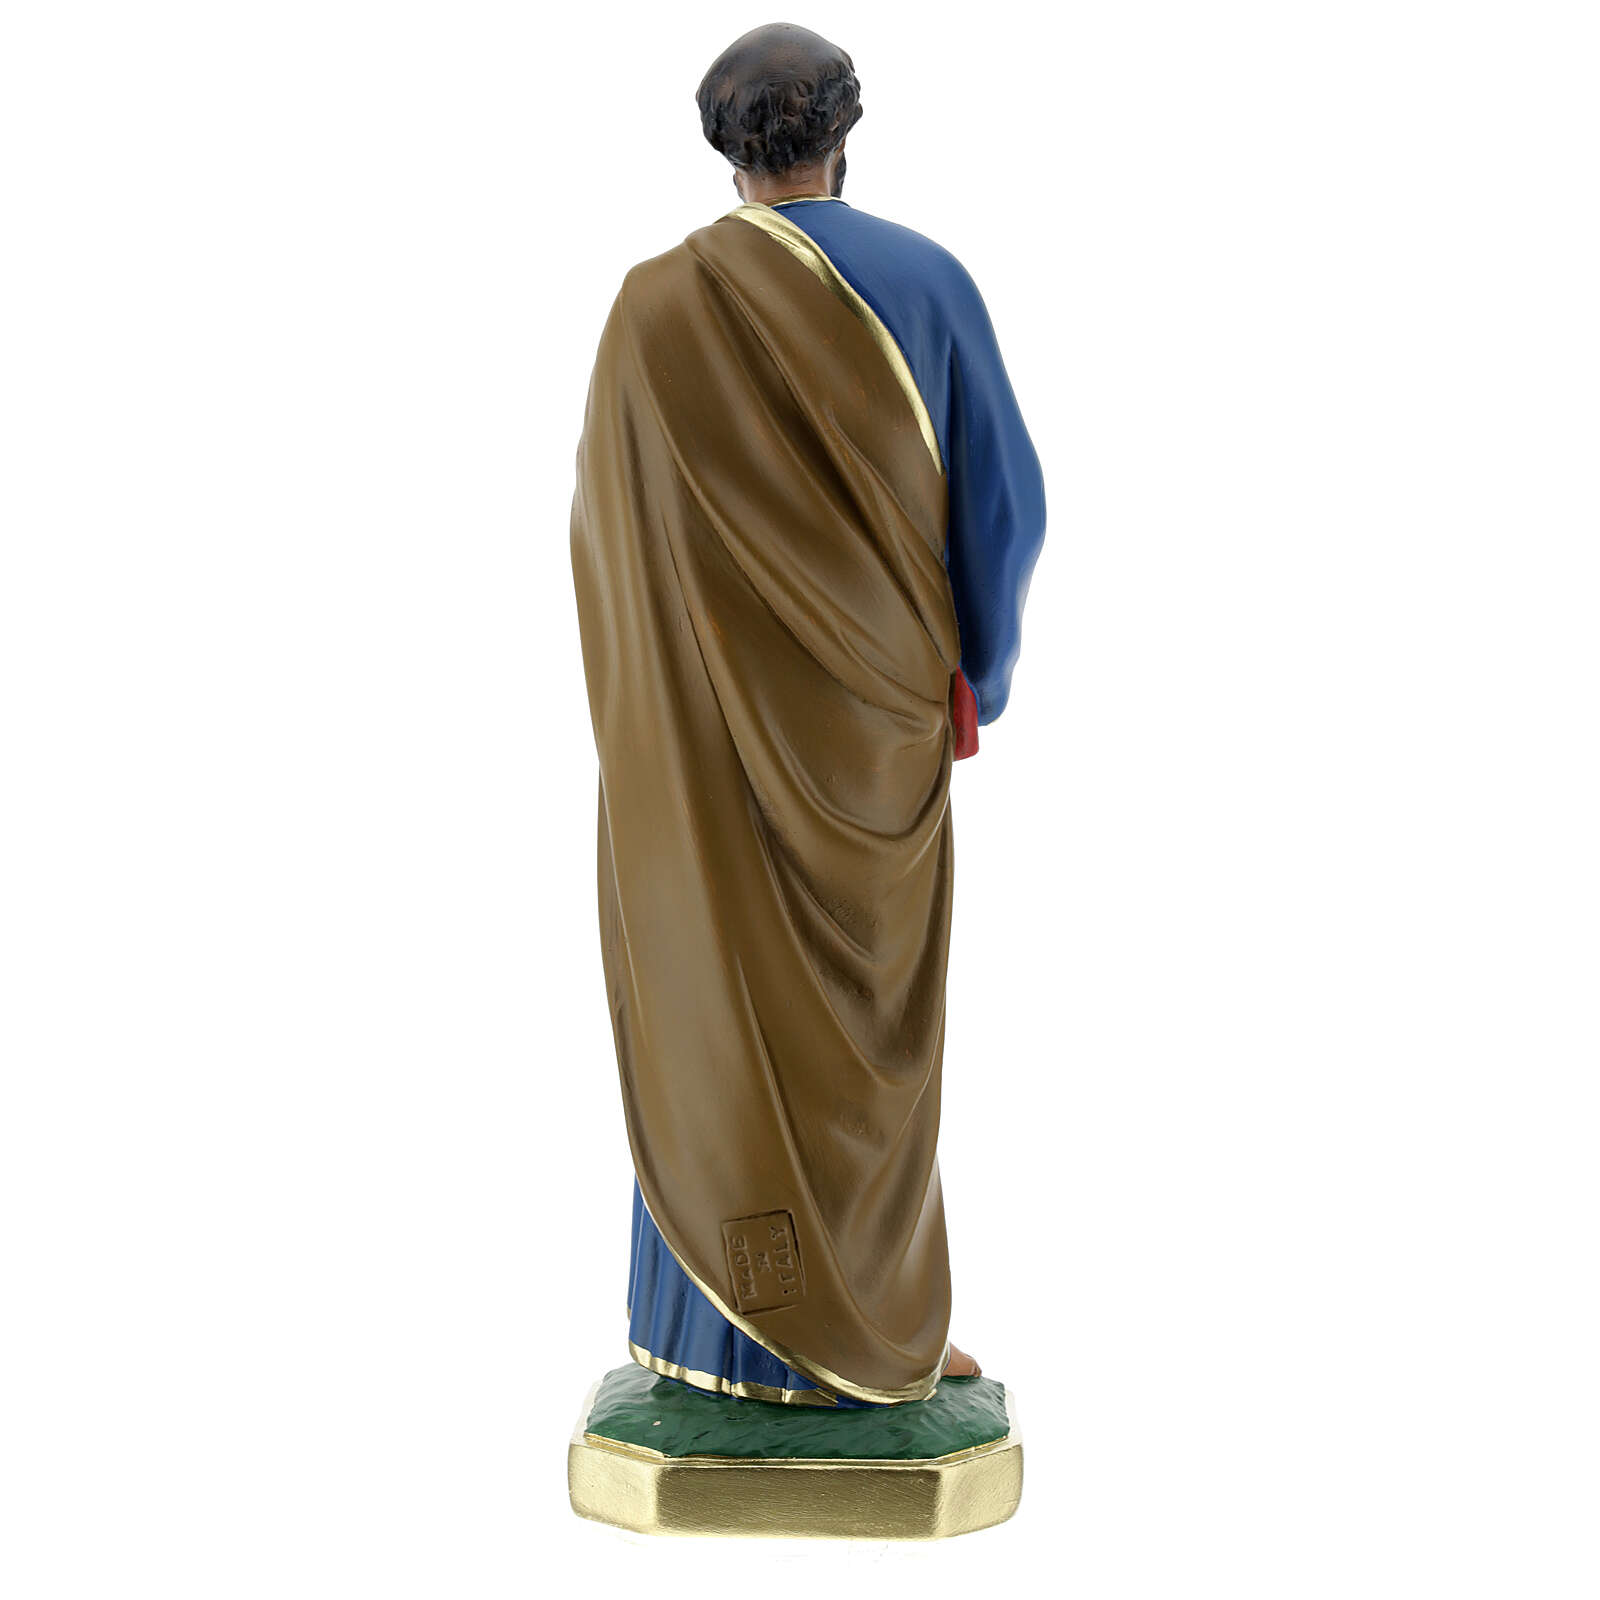 St. Peter plaster statue 30 cm hand painted Arte Barsanti 4